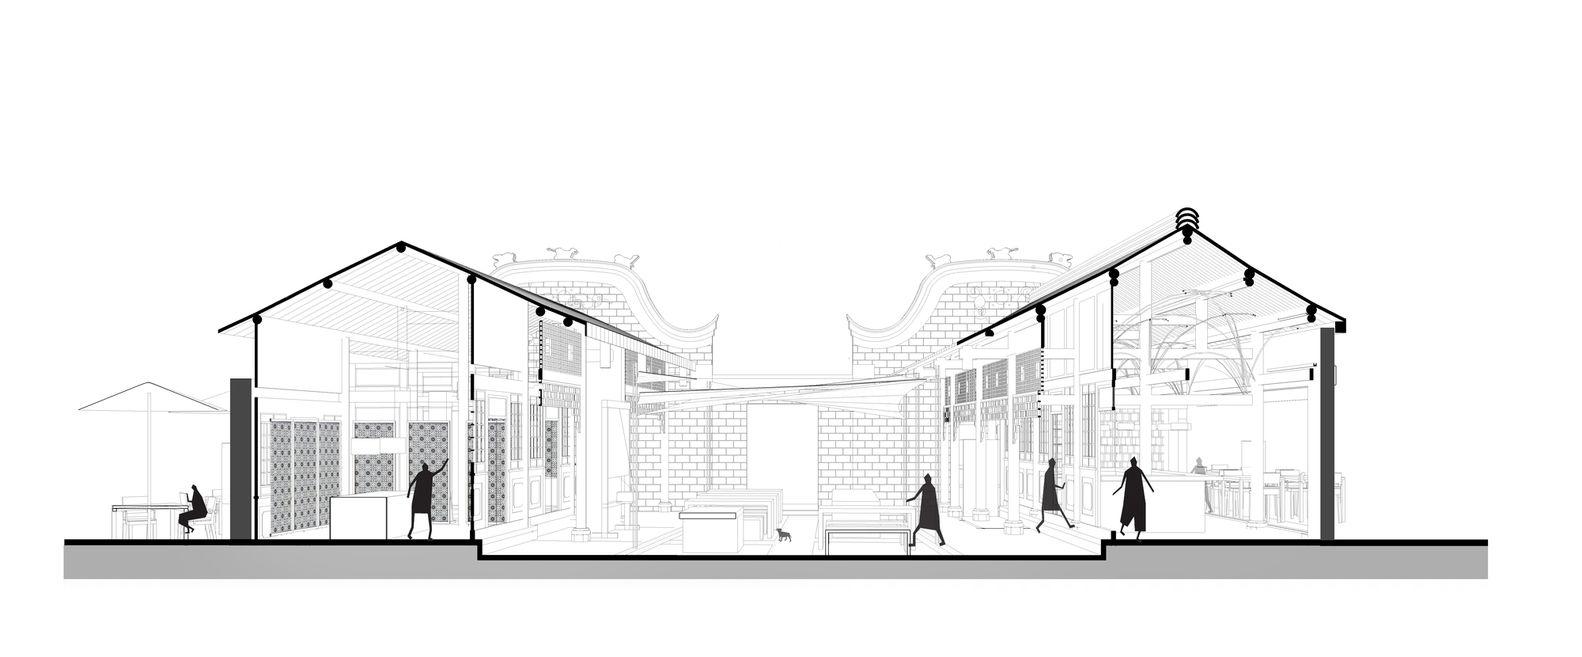 Abbaye_Belgium_Resturant_-_MRDA_Architects.jpg (1582×657)